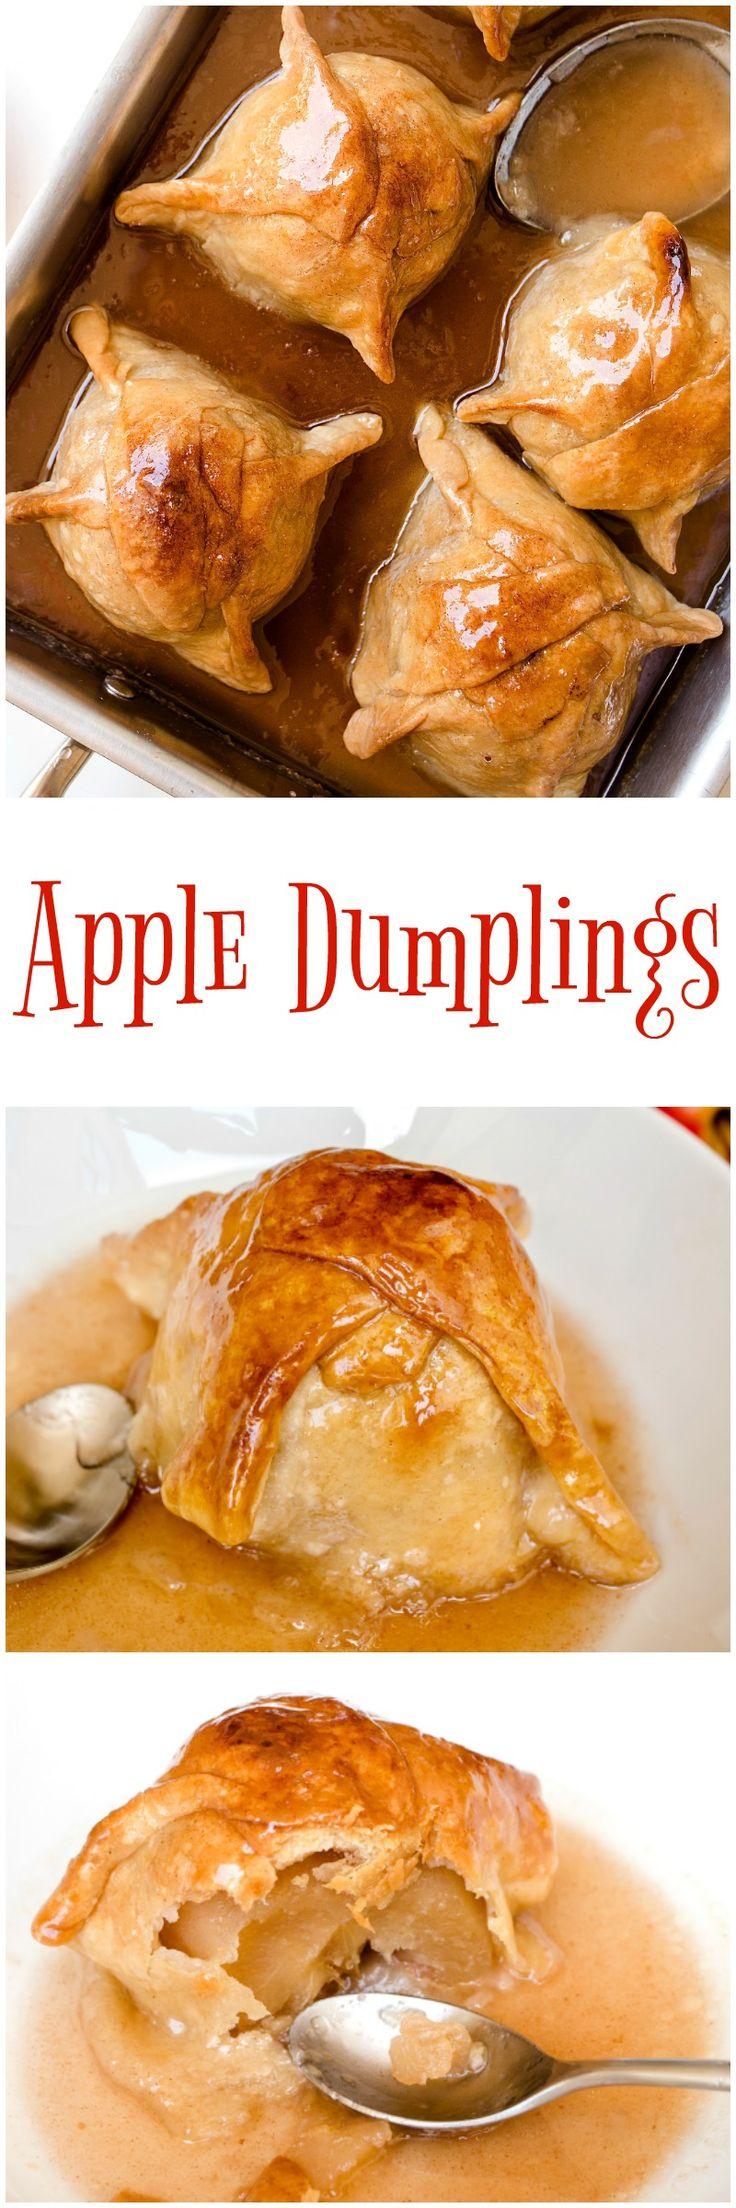 Apple Dumplings 7e79135da2336e029e85e06cb0ae037c